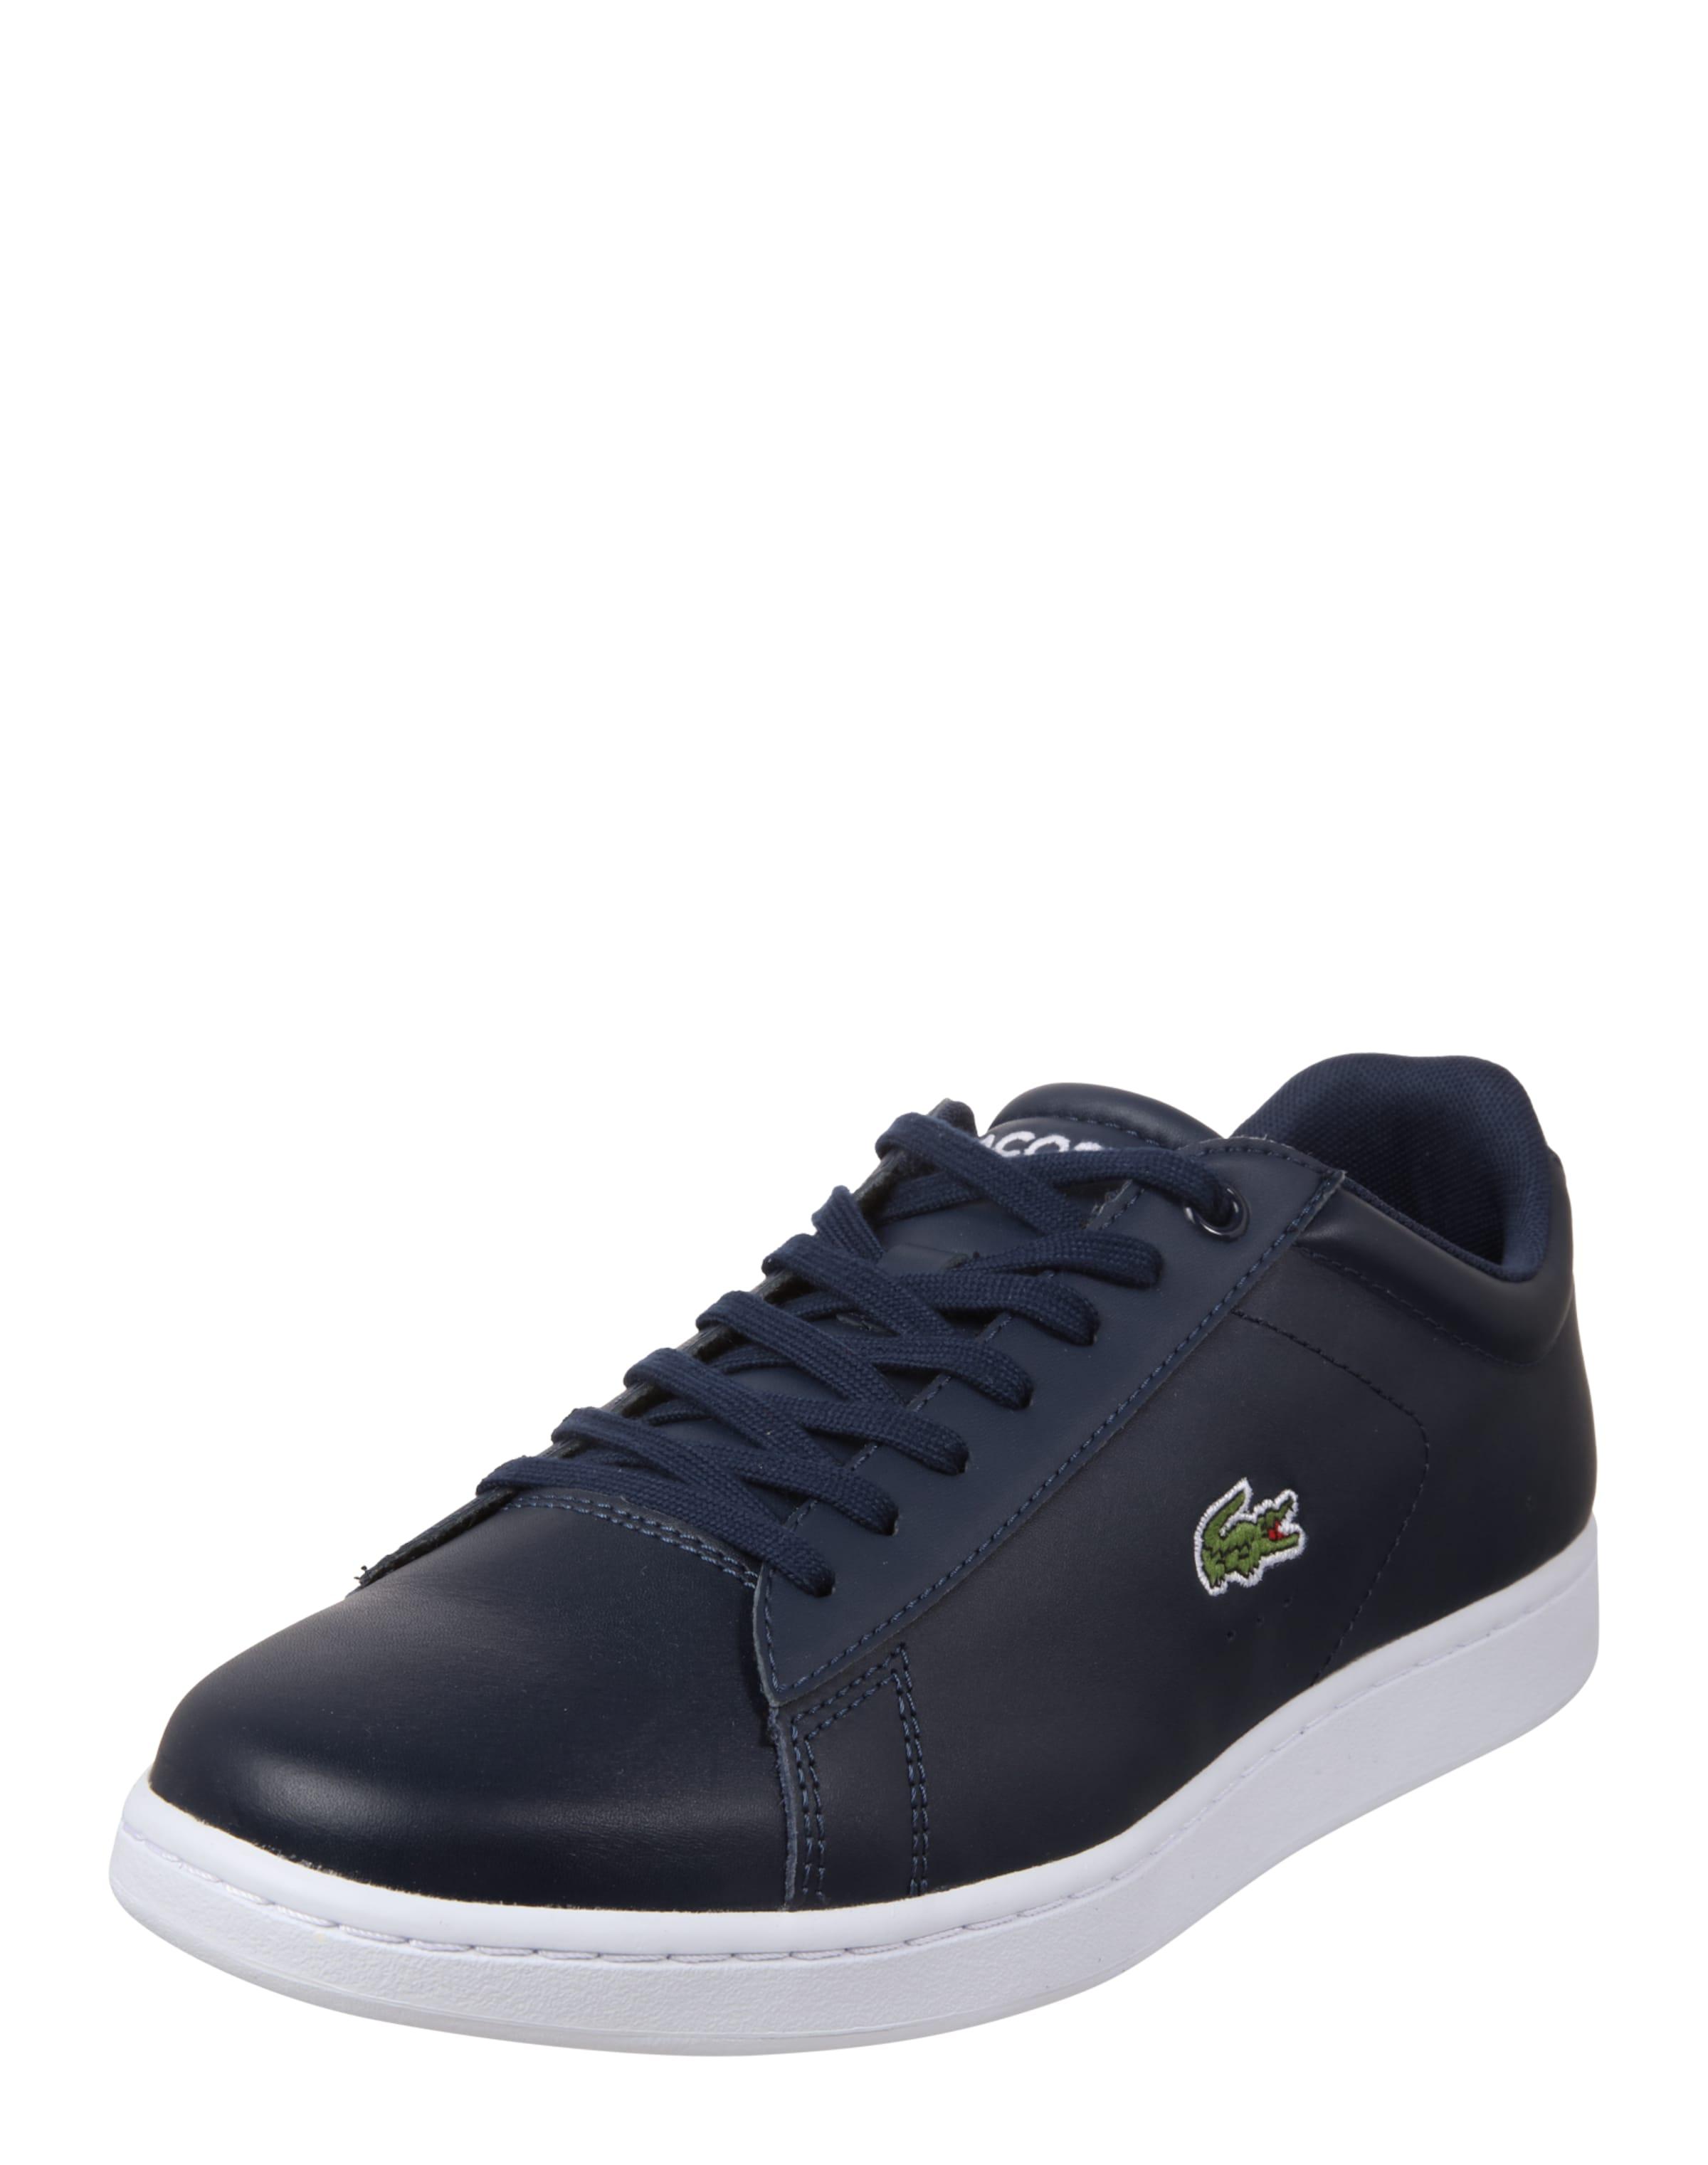 LACOSTE Sneaker Verschleißfeste Carnaby Verschleißfeste Sneaker billige Schuhe b93a8e